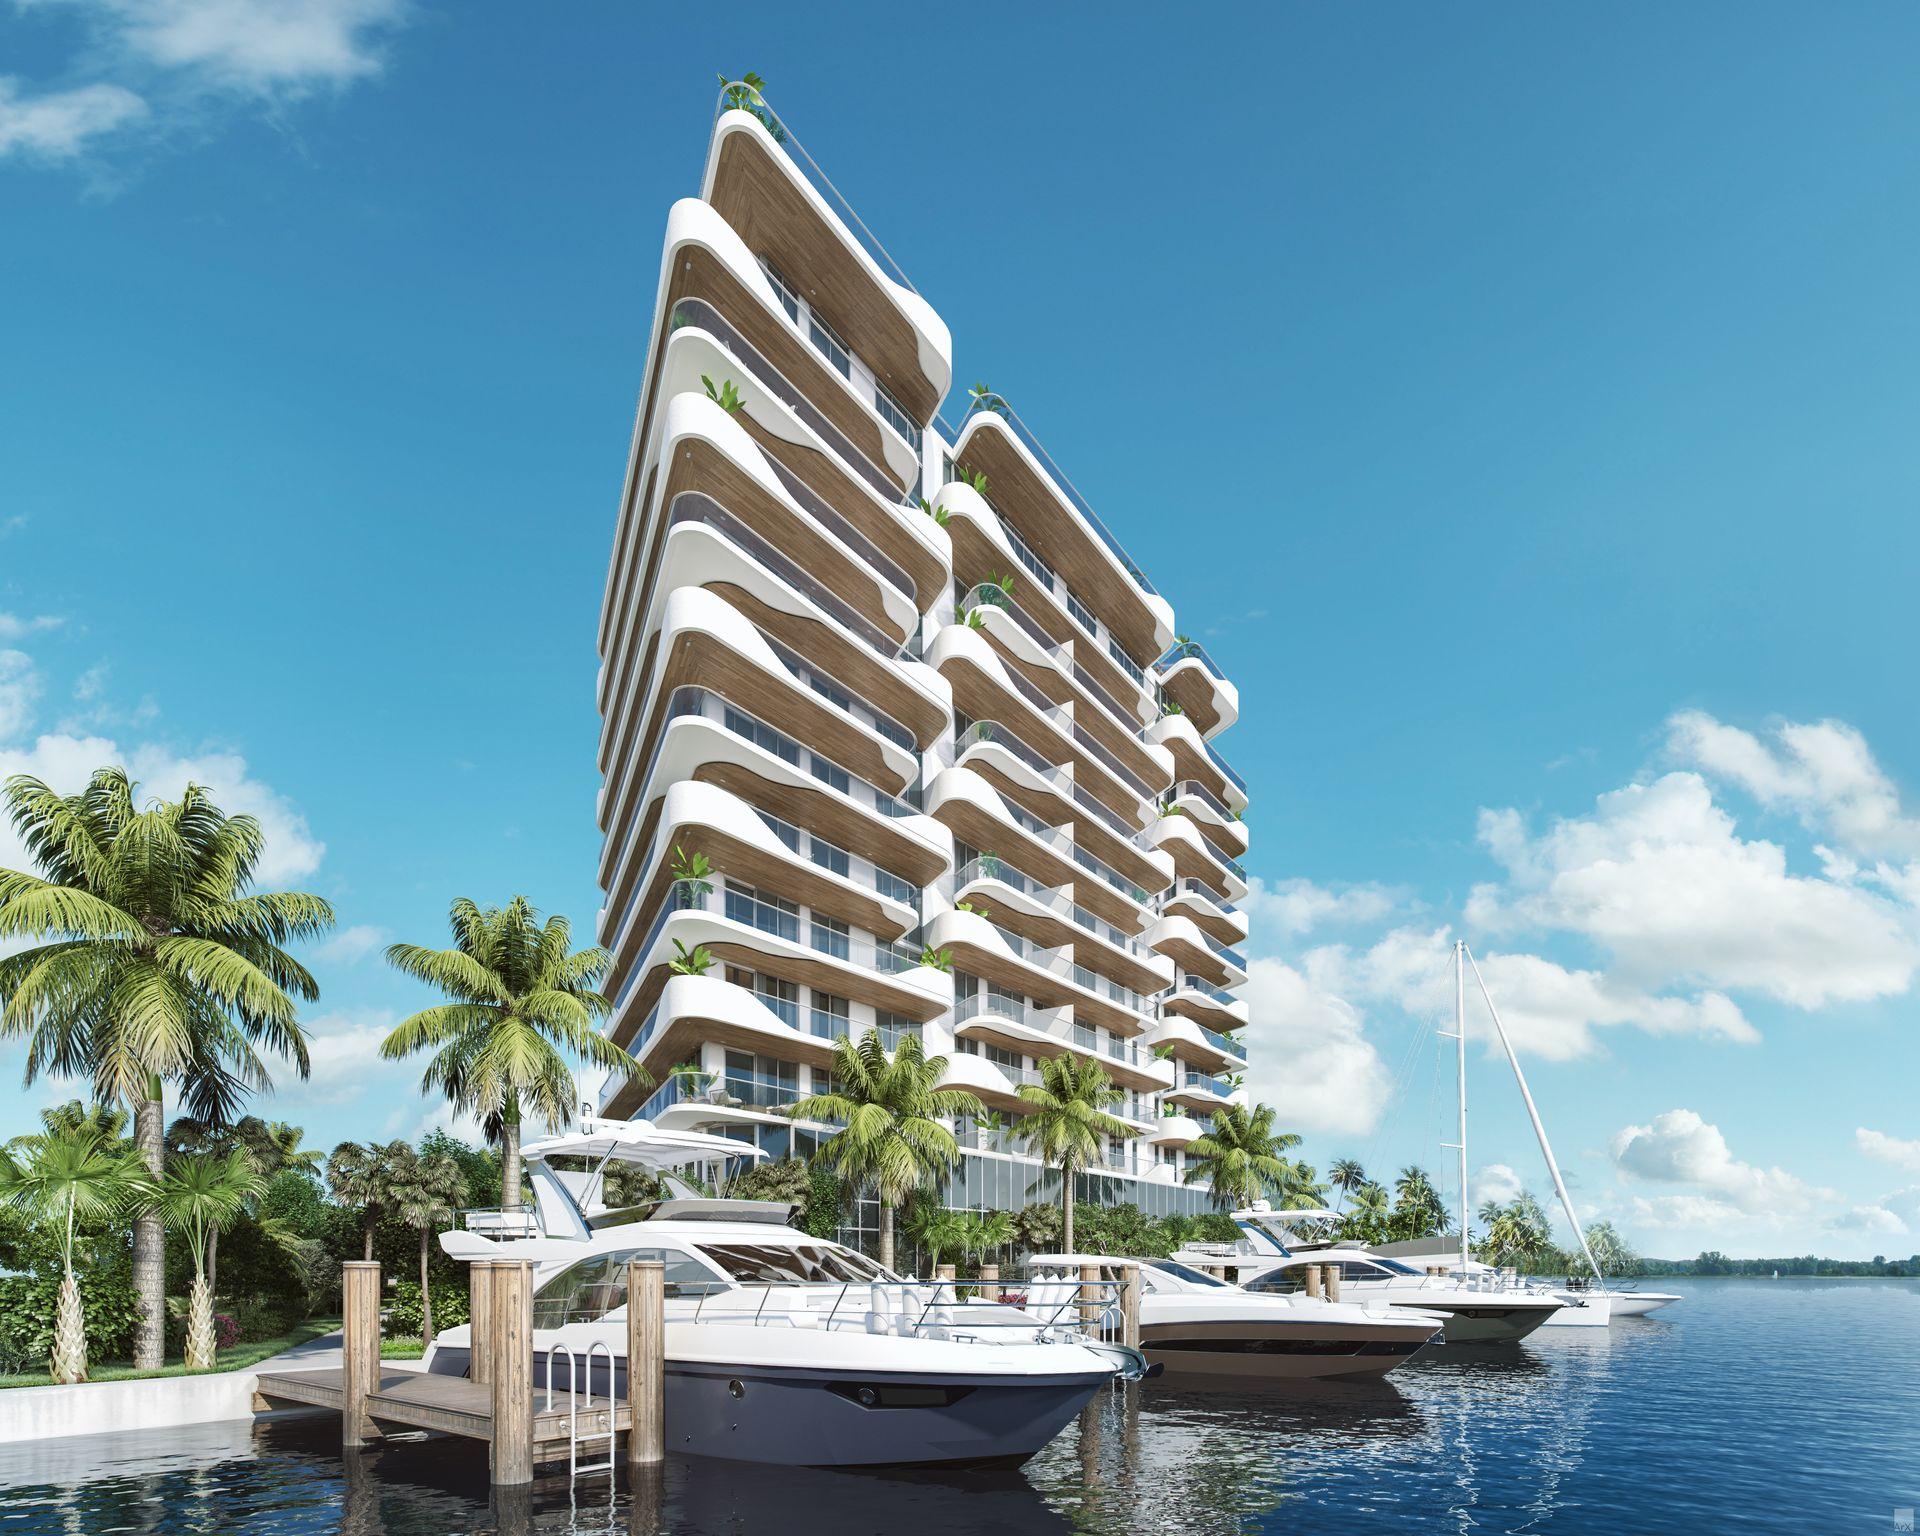 Monaco Yacht Club & Residences